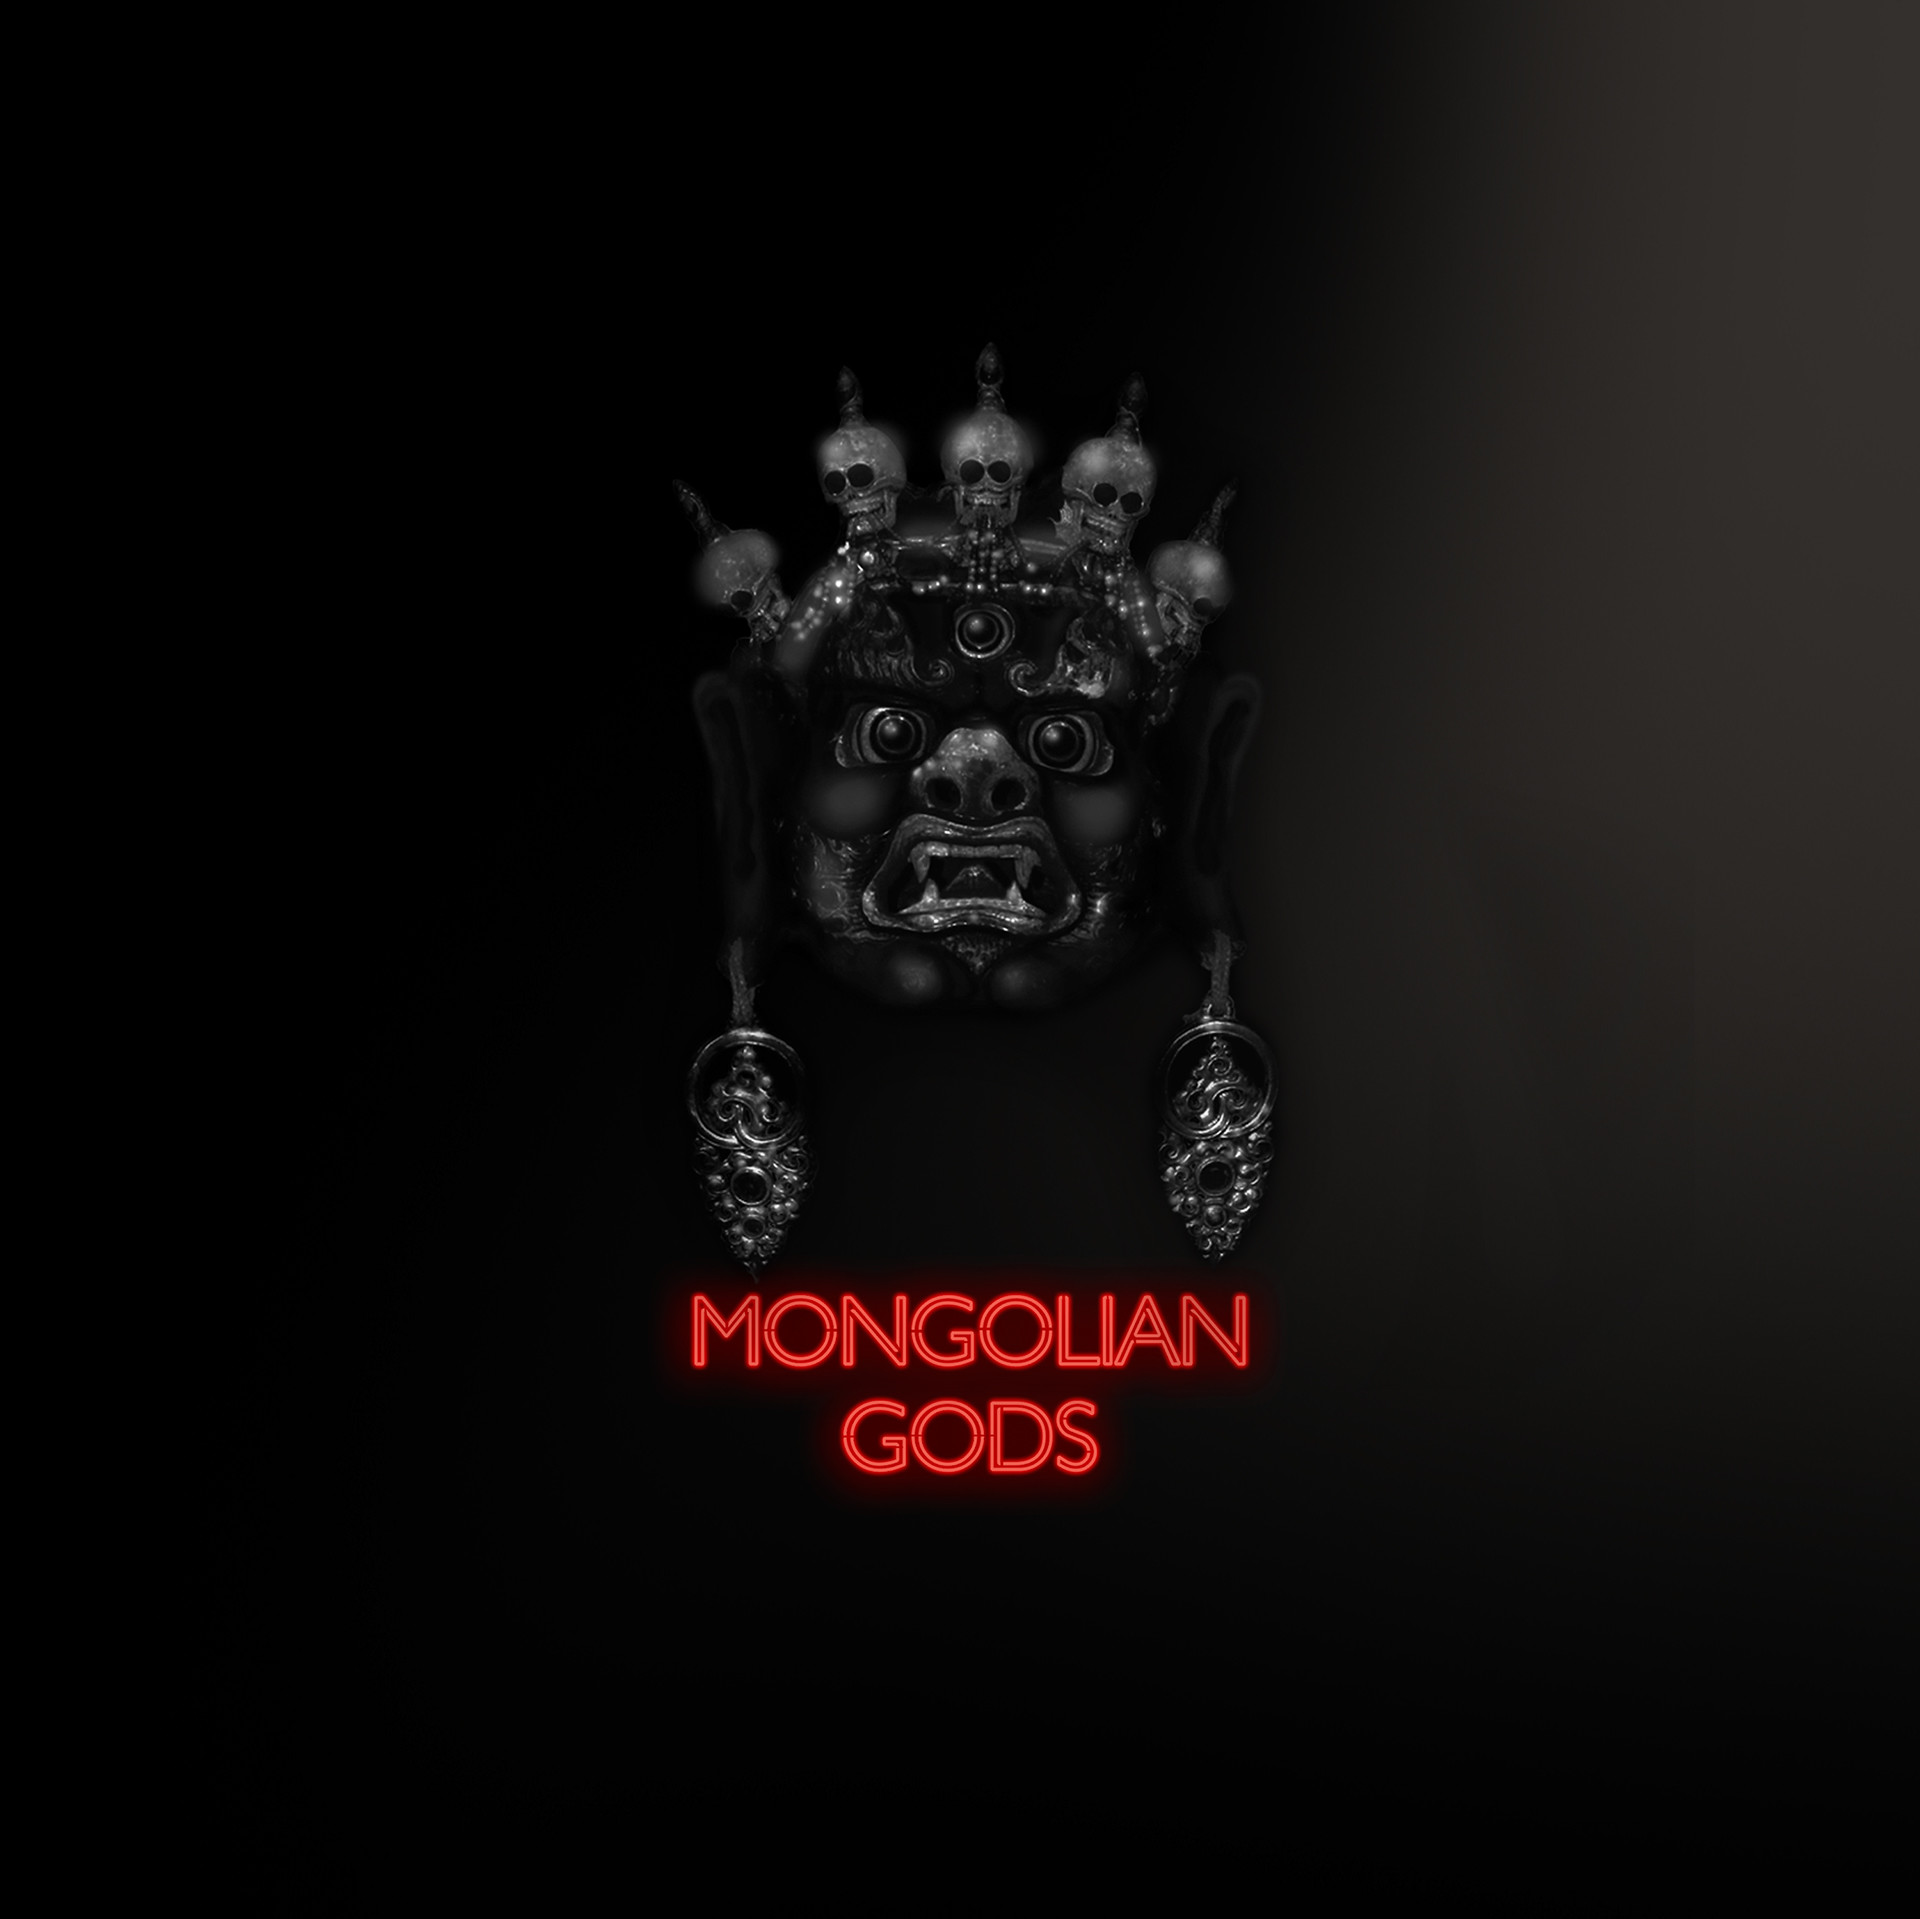 Mongolian Gods